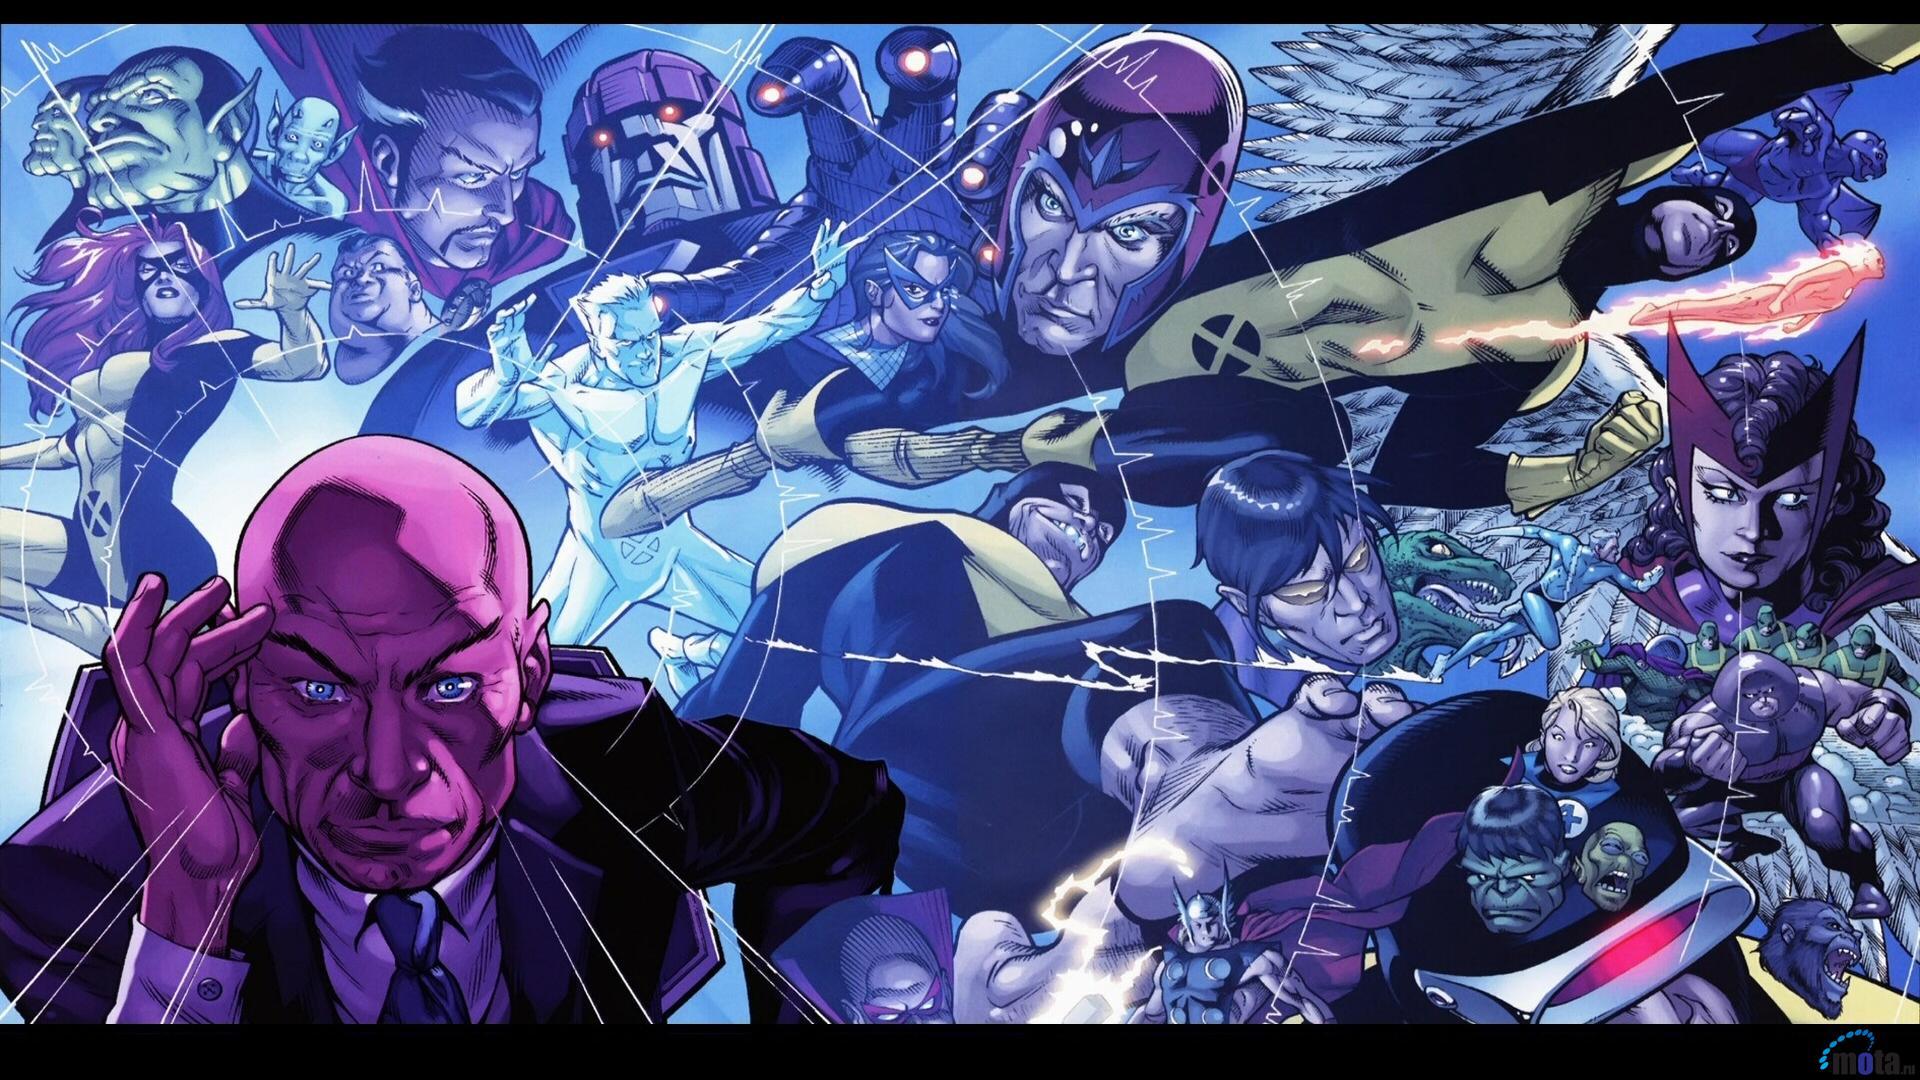 Marvel HD Wallpapers 1080p - WallpaperSafari Deadpool Vs Spiderman Wallpaper 1920x1080